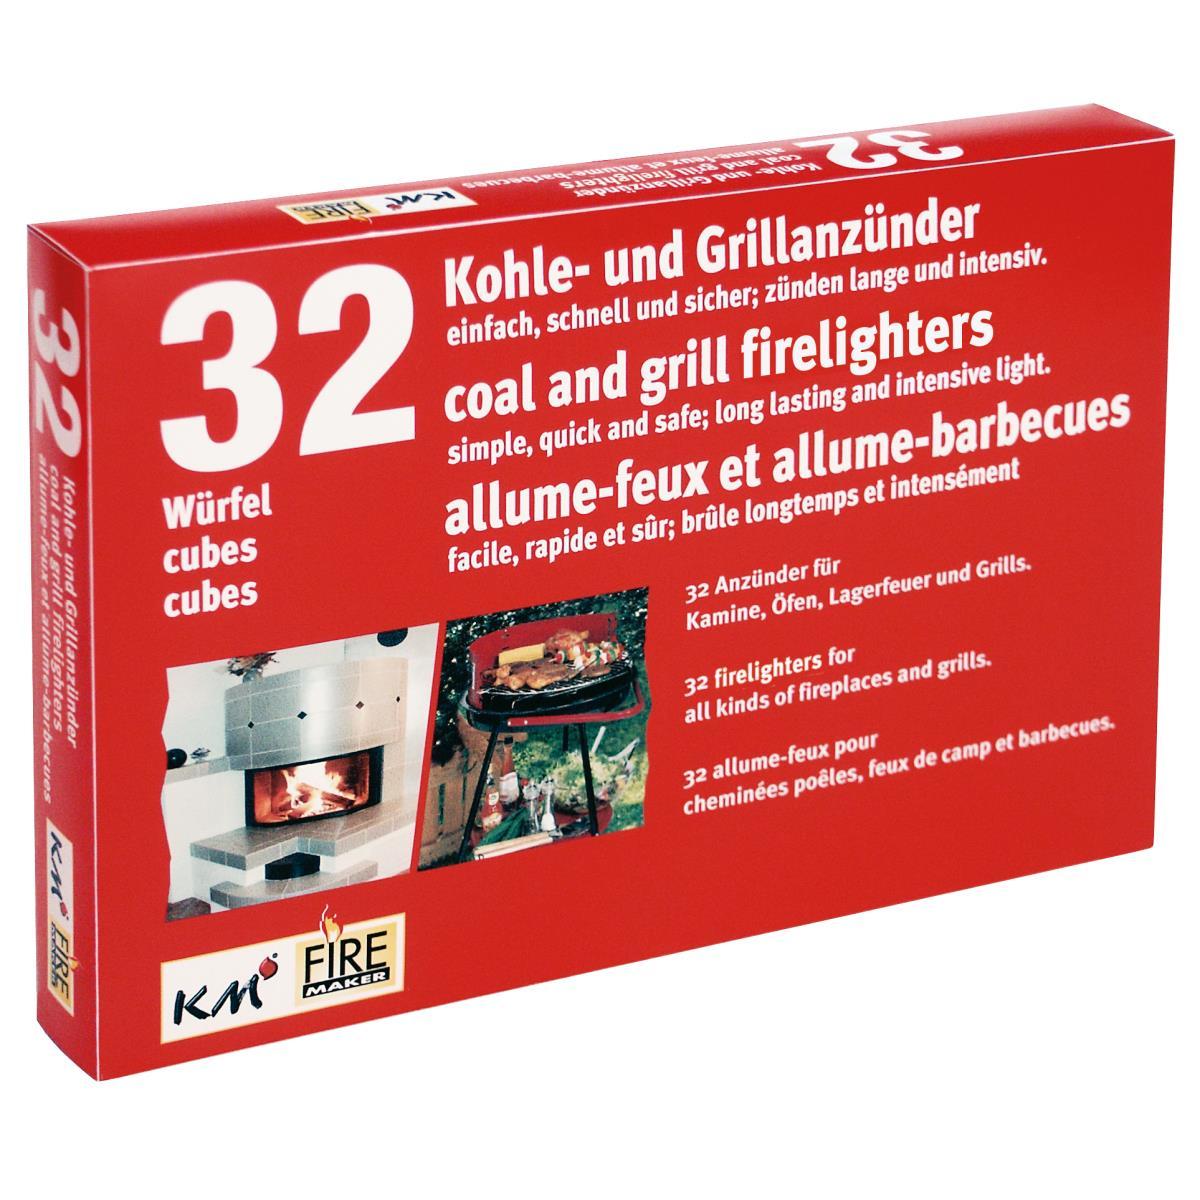 Anzündwürfel Ofenanzünder Kaminanzünder Kohleanzünder Holzanzünder Kaminholz ,K M,0000200, 4004753902006